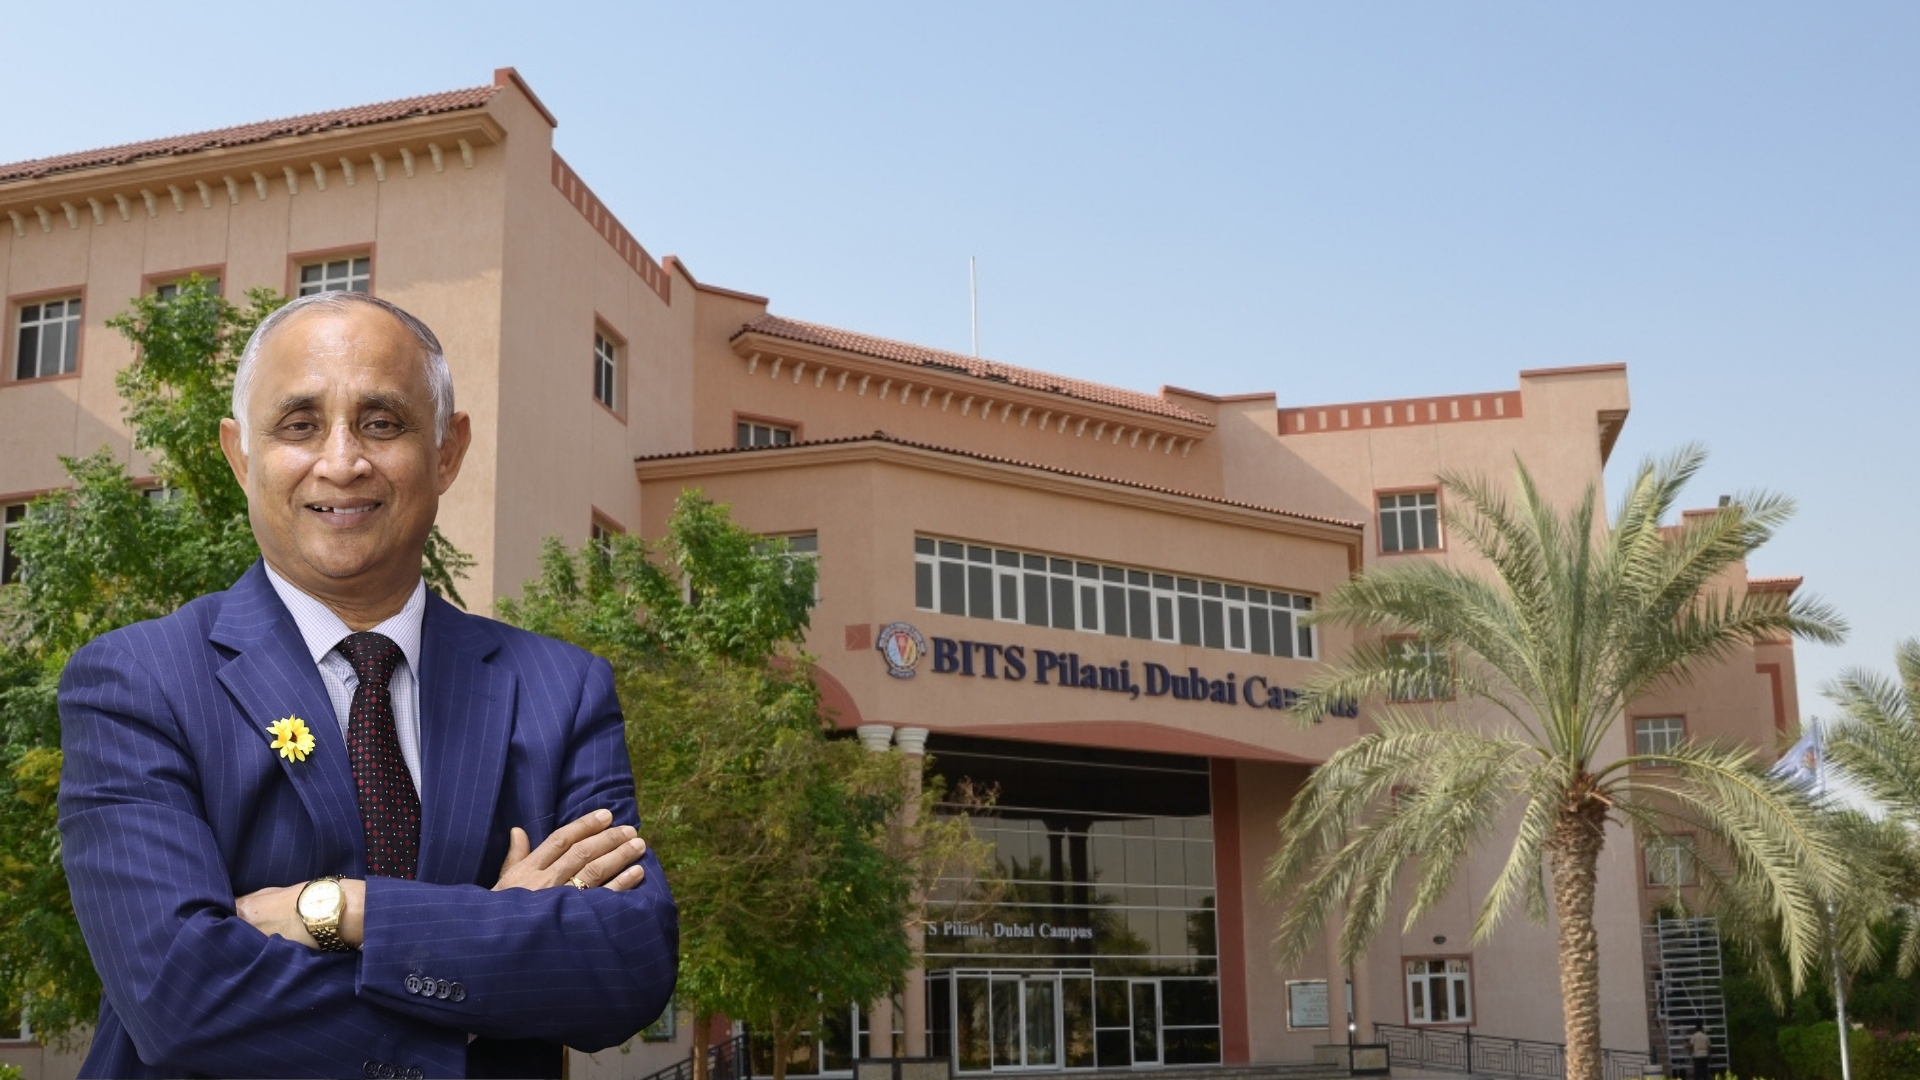 BITS_Pilani,_Dubai_-_Yallaschools_Press_Release